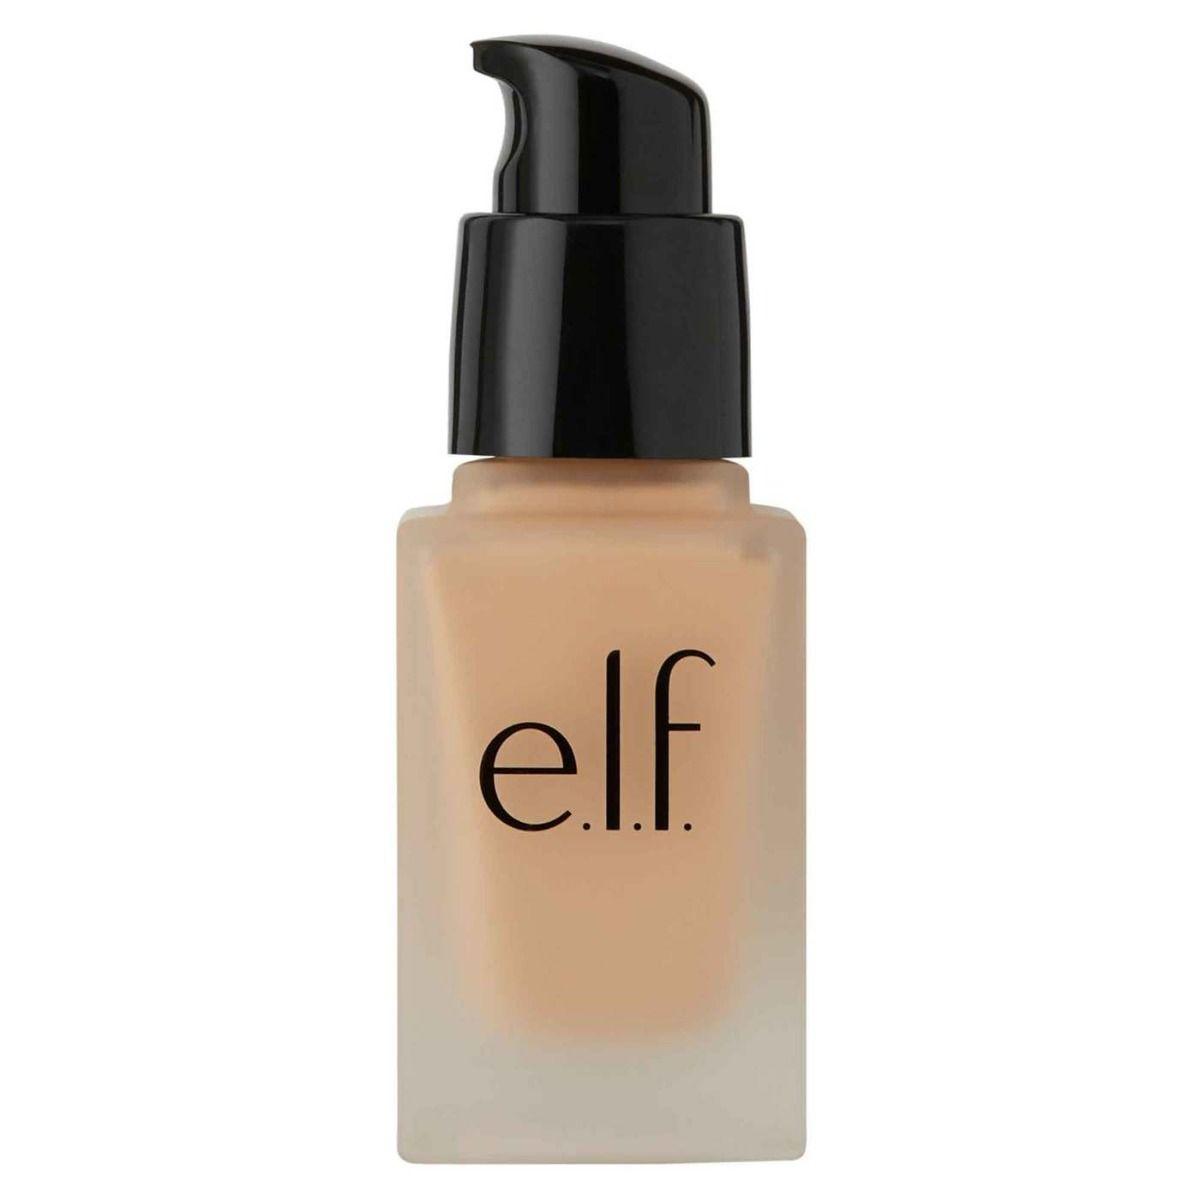 e.l.f Cosmetics Flawless Finish Foundation Nude